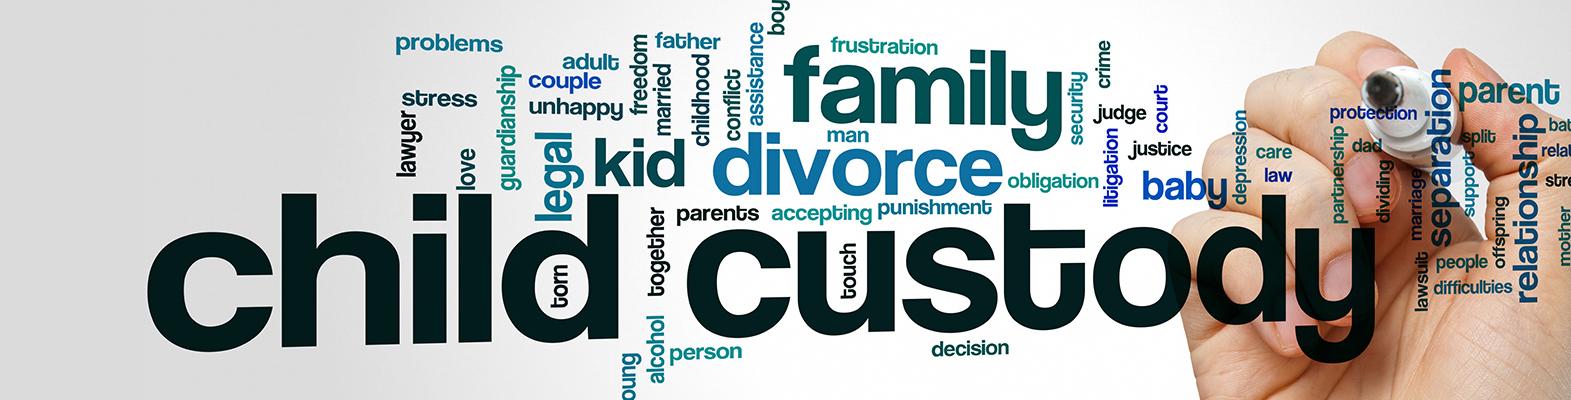 child custody concept banner